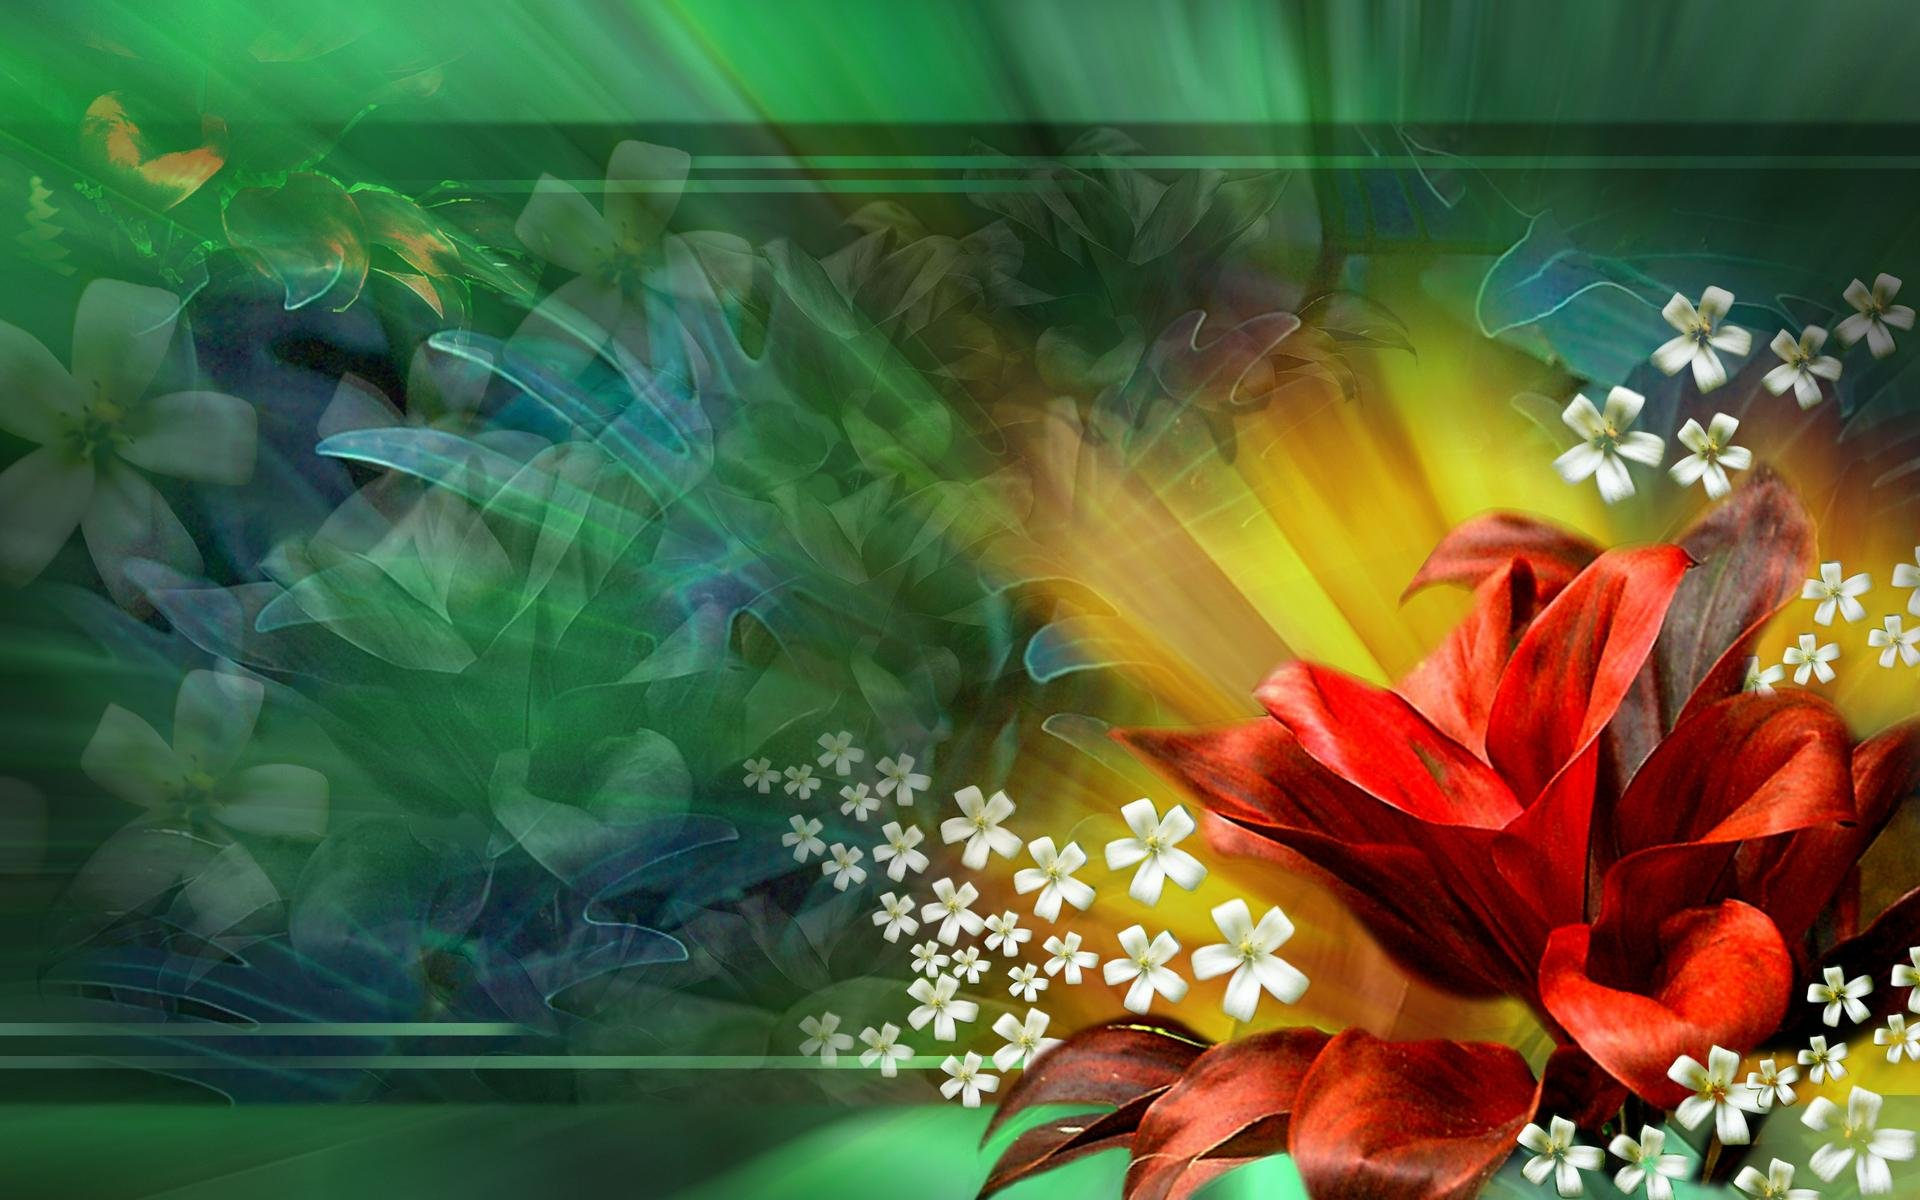 3D Flower Abstract Wallpaper Live 4K Wallpapers